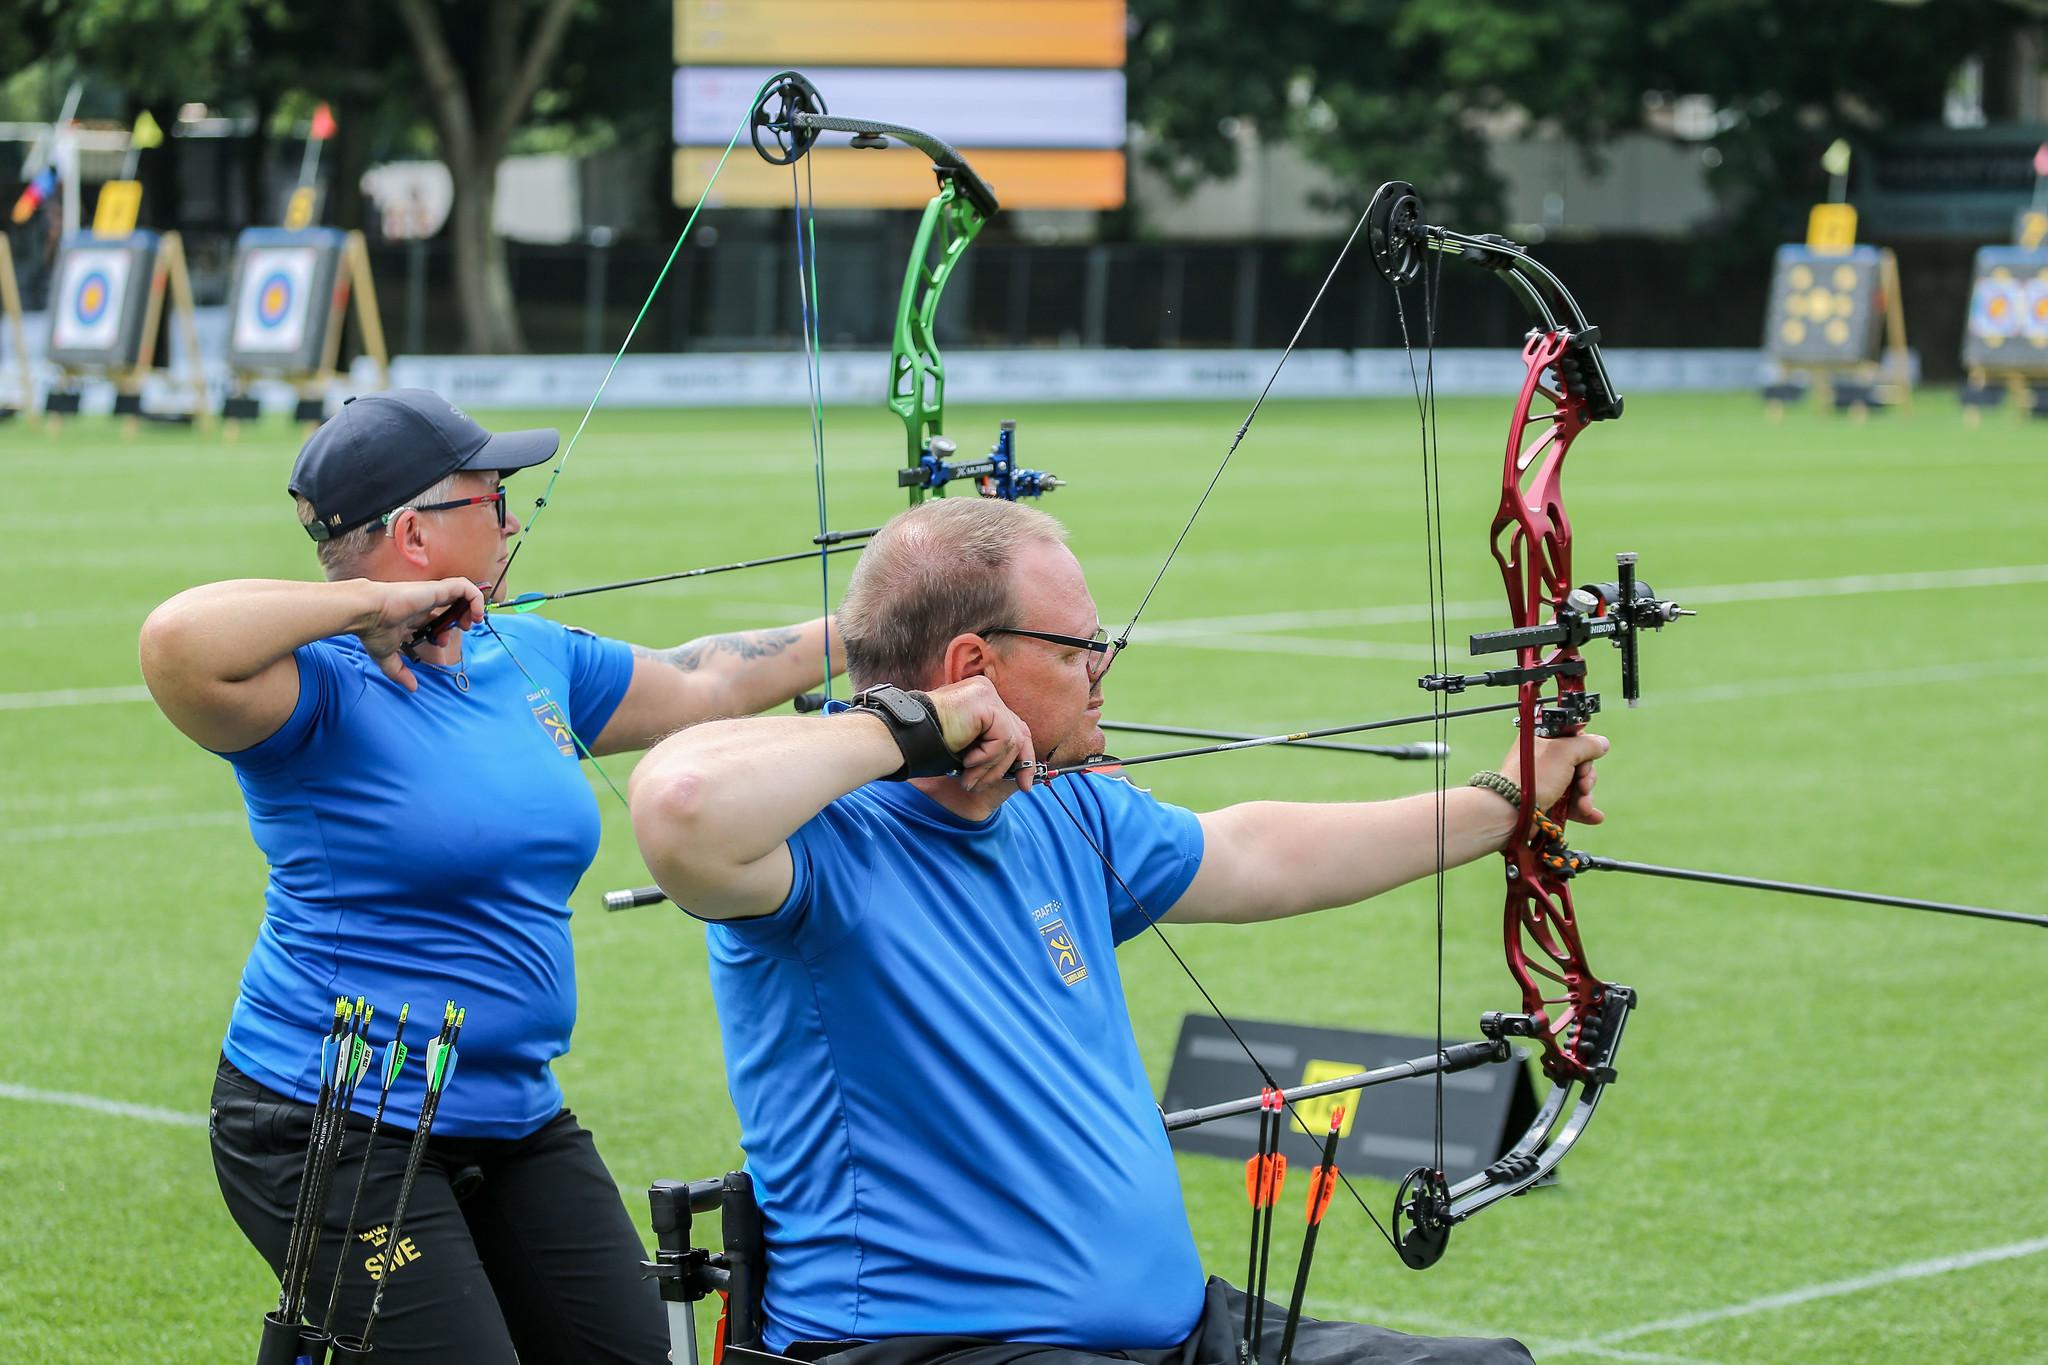 World Para Archery s-Hertogenbosch 2019